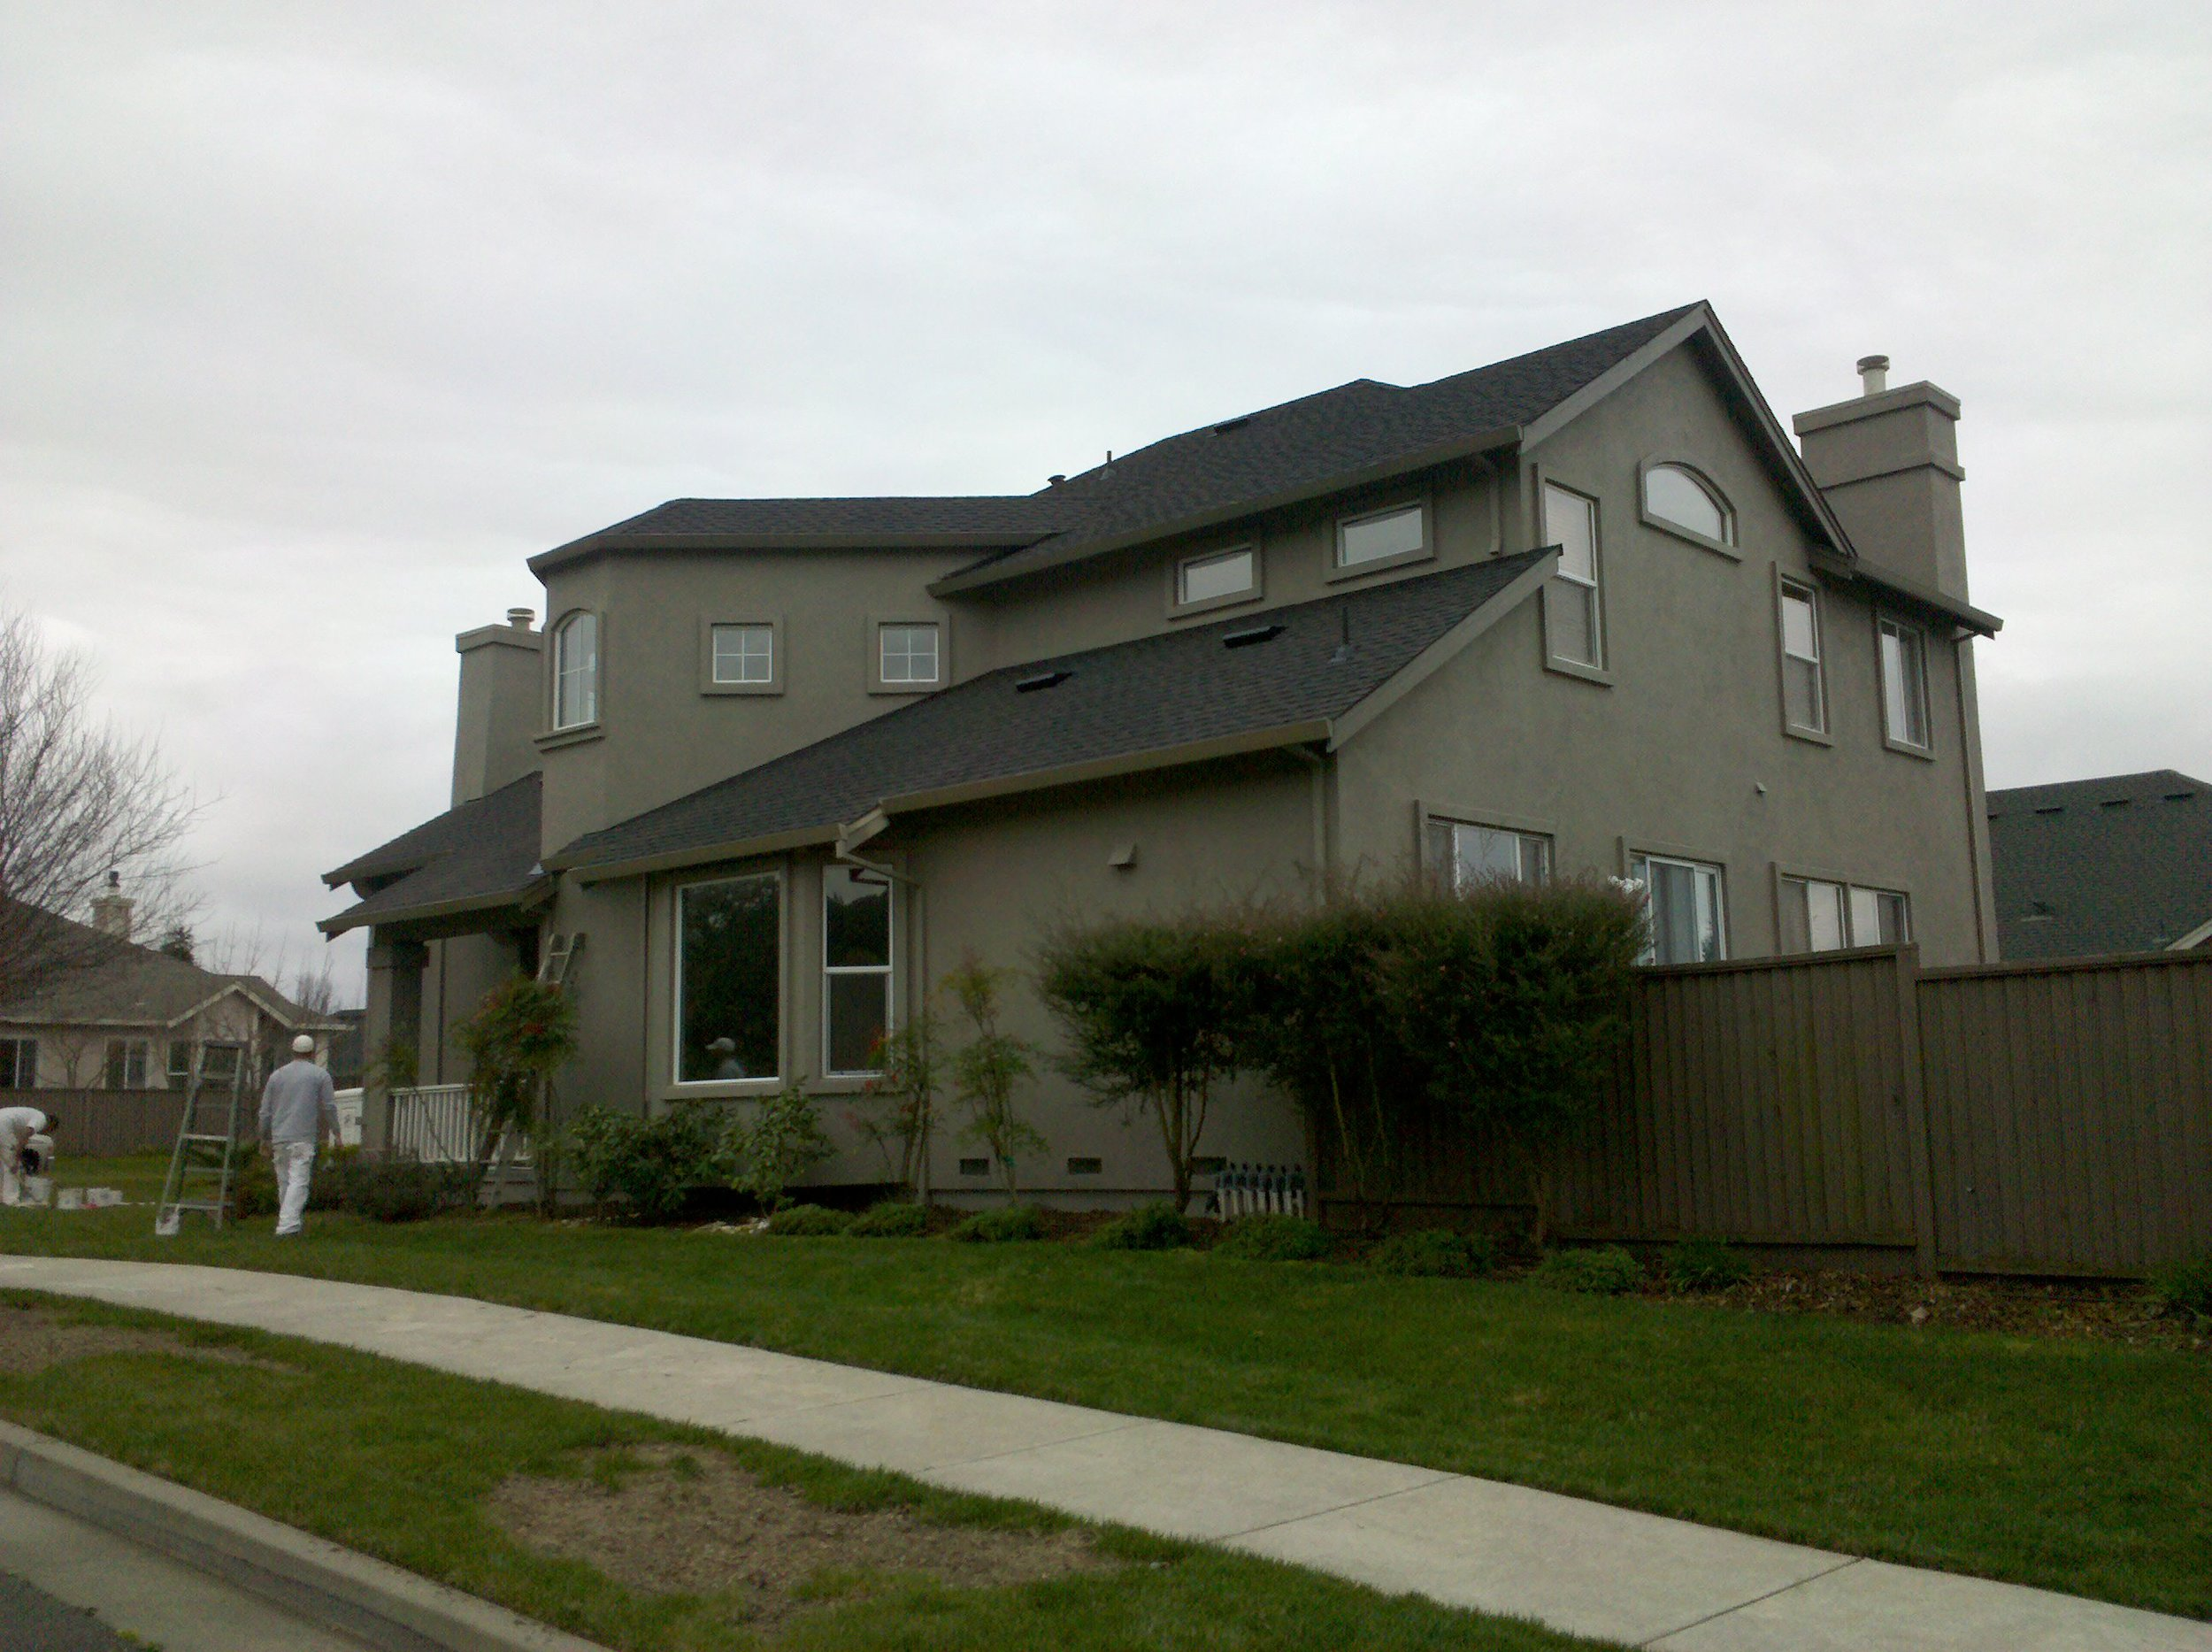 Santa Rosa exterior.jpg